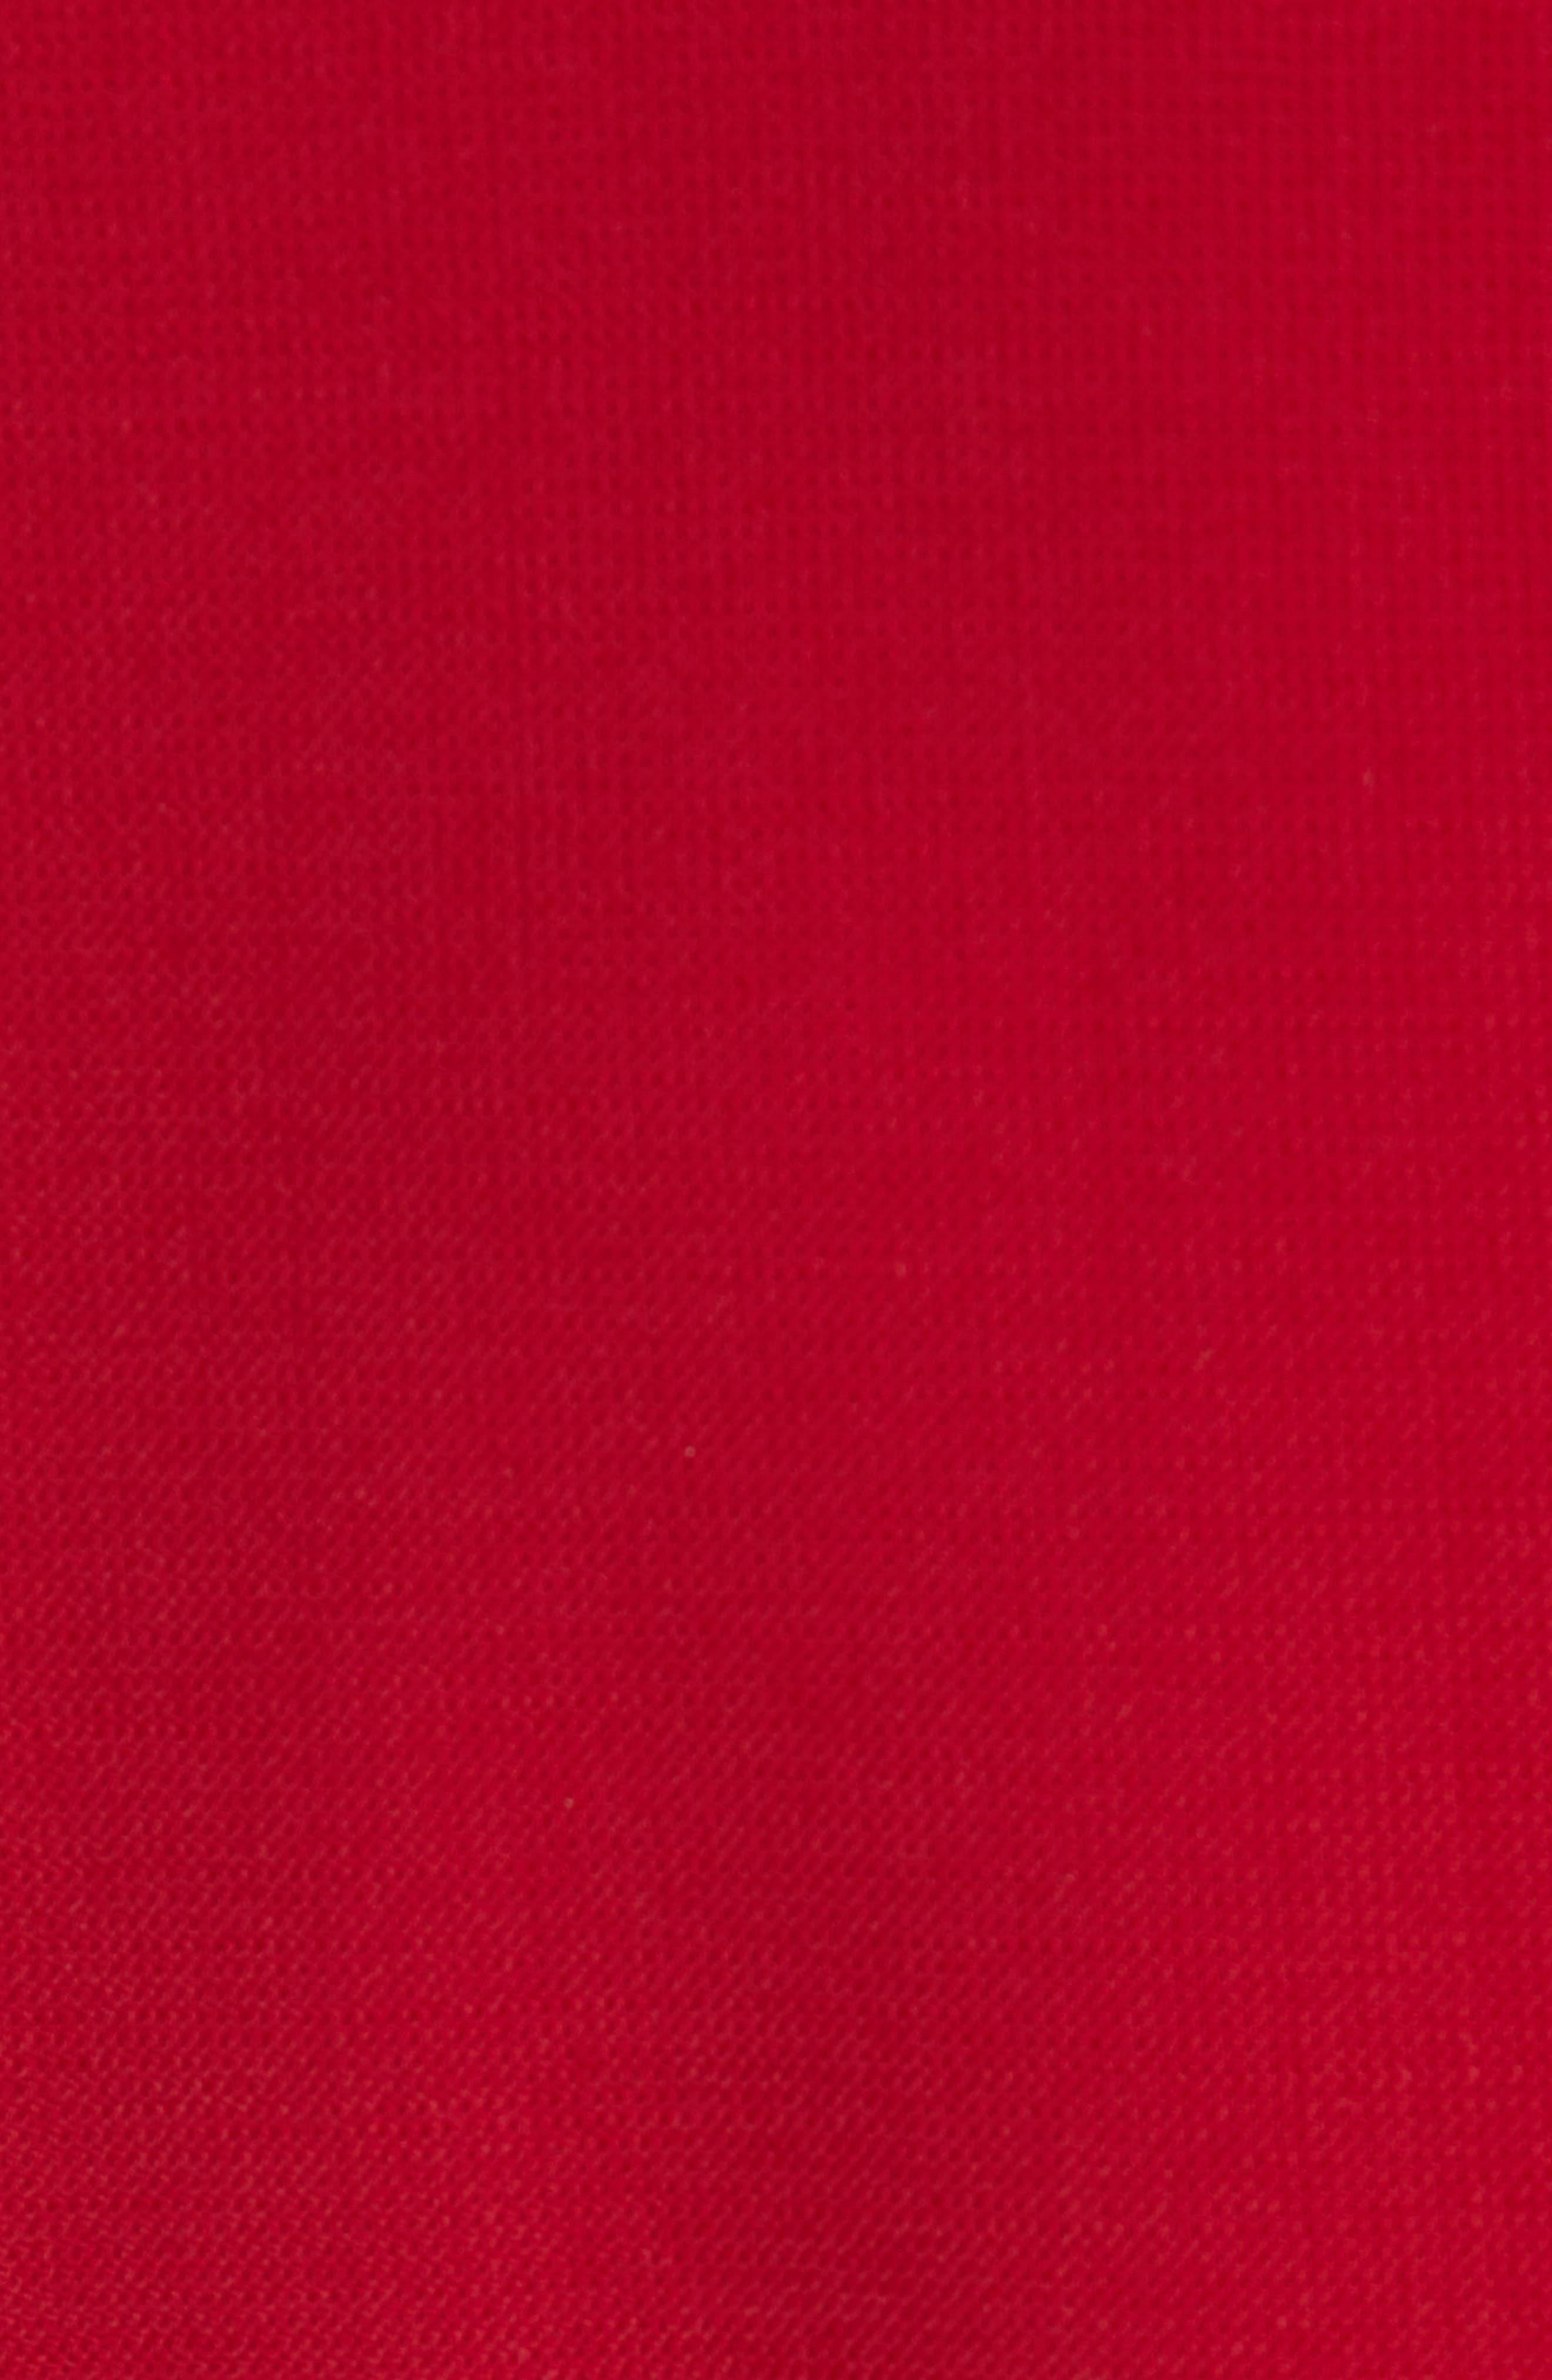 Danufa Stretch Wool Sheath Dress,                             Alternate thumbnail 6, color,                             DARK RED